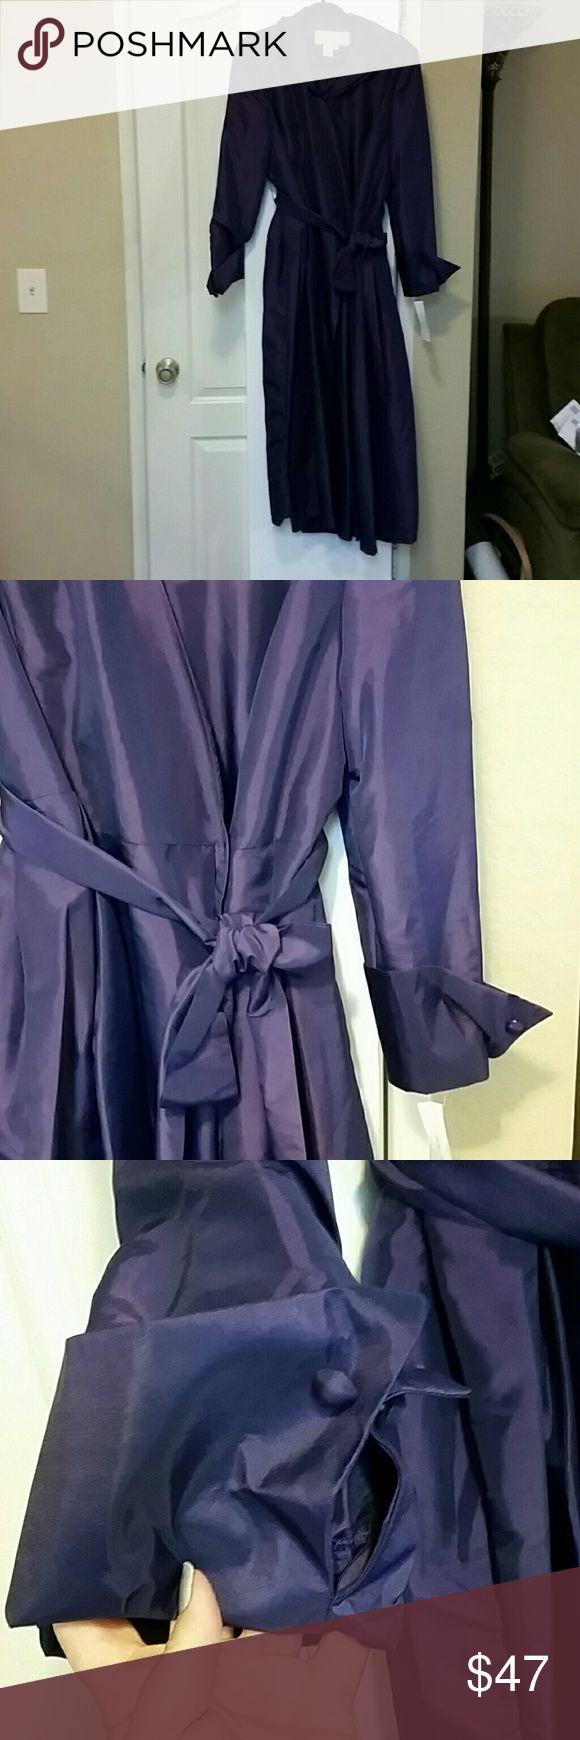 Purple dress Purple tea length dress with belt and french cut sleeves nubiano Dresses